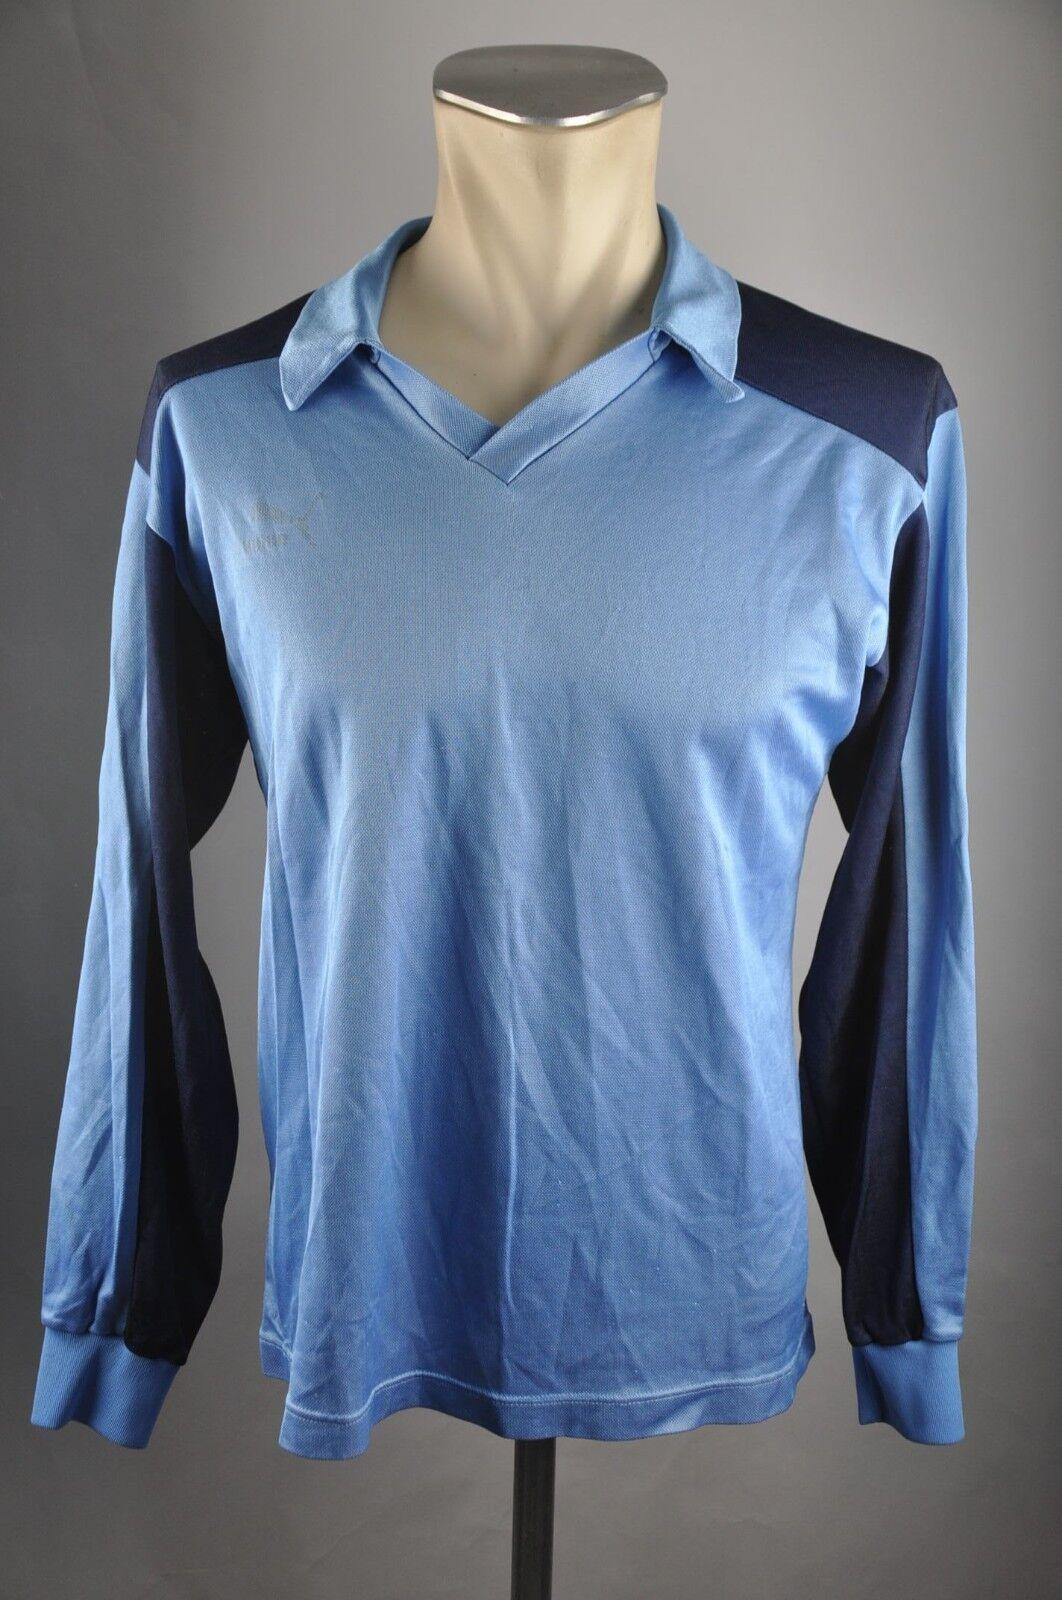 Puma vintage Trikot 80er oldschool Shirt blau Gr. LS Gr. blau M jersey 80s VG1 cbb1bb